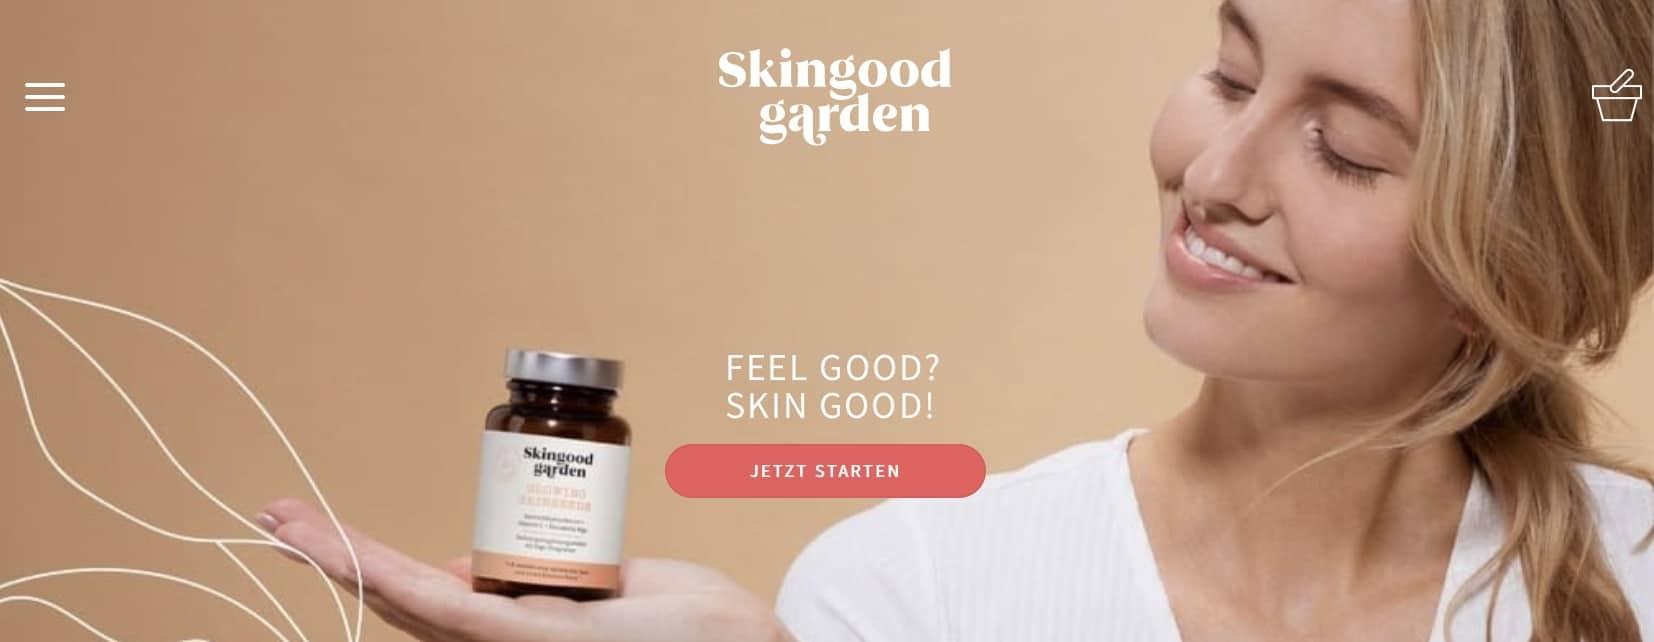 Skingood Garden Erfahrungen Produkte Skin Seeds Body Seeds Nahrungsergänzungsmittel